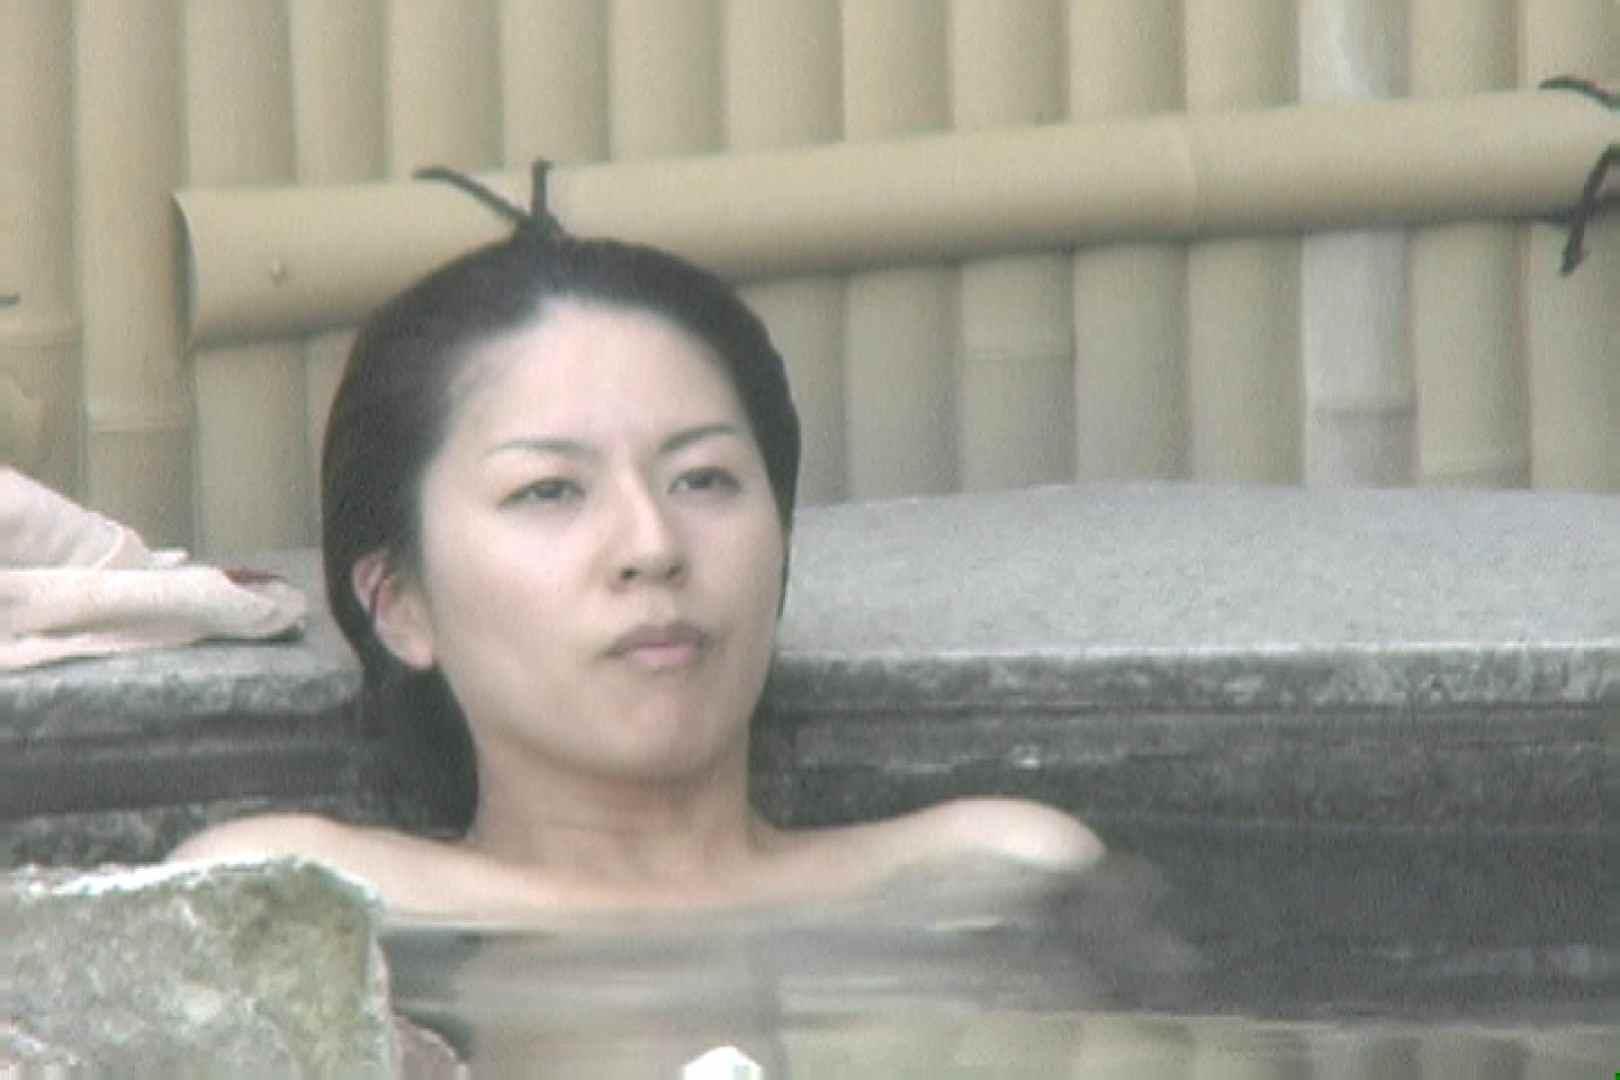 Aquaな露天風呂Vol.694 盗撮 | OLエロ画像  110PICs 52